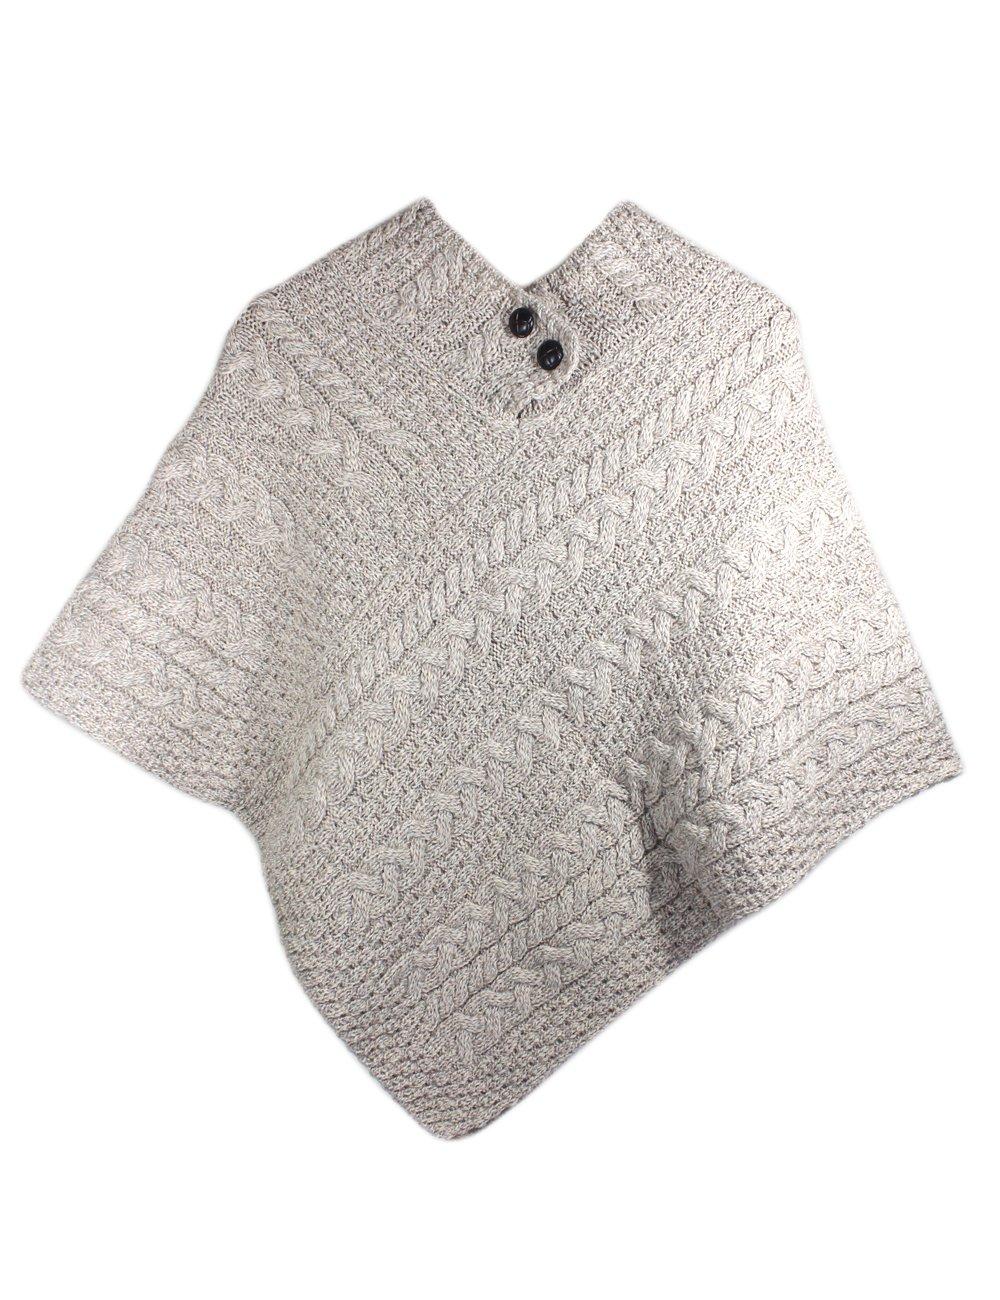 Fisherman Knit Poncho 100% Merino Wool Natural by Carraig Donn (Image #2)